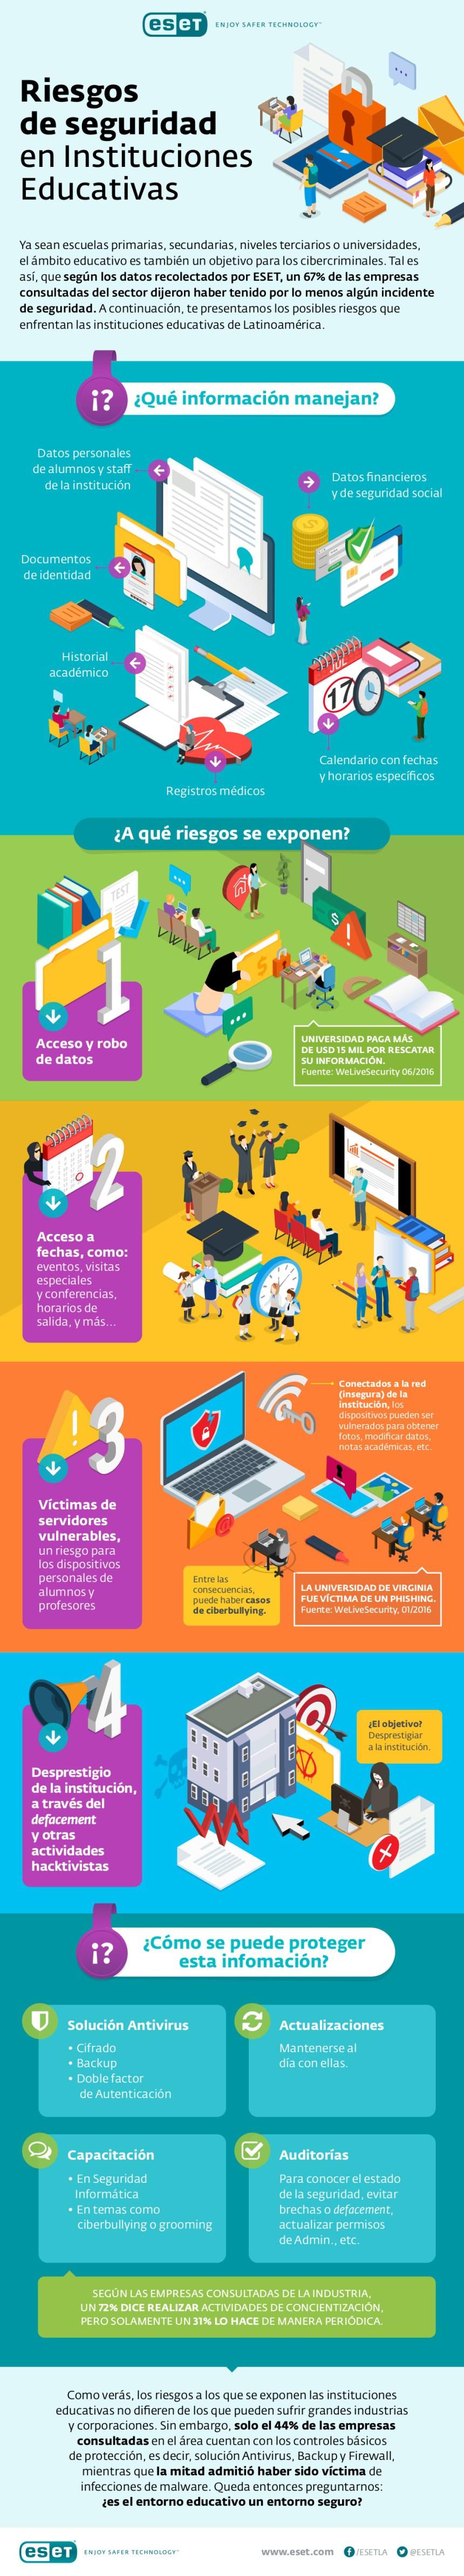 Riesgos de seguridad en Instituciones Educativas #infografia #infographic #education